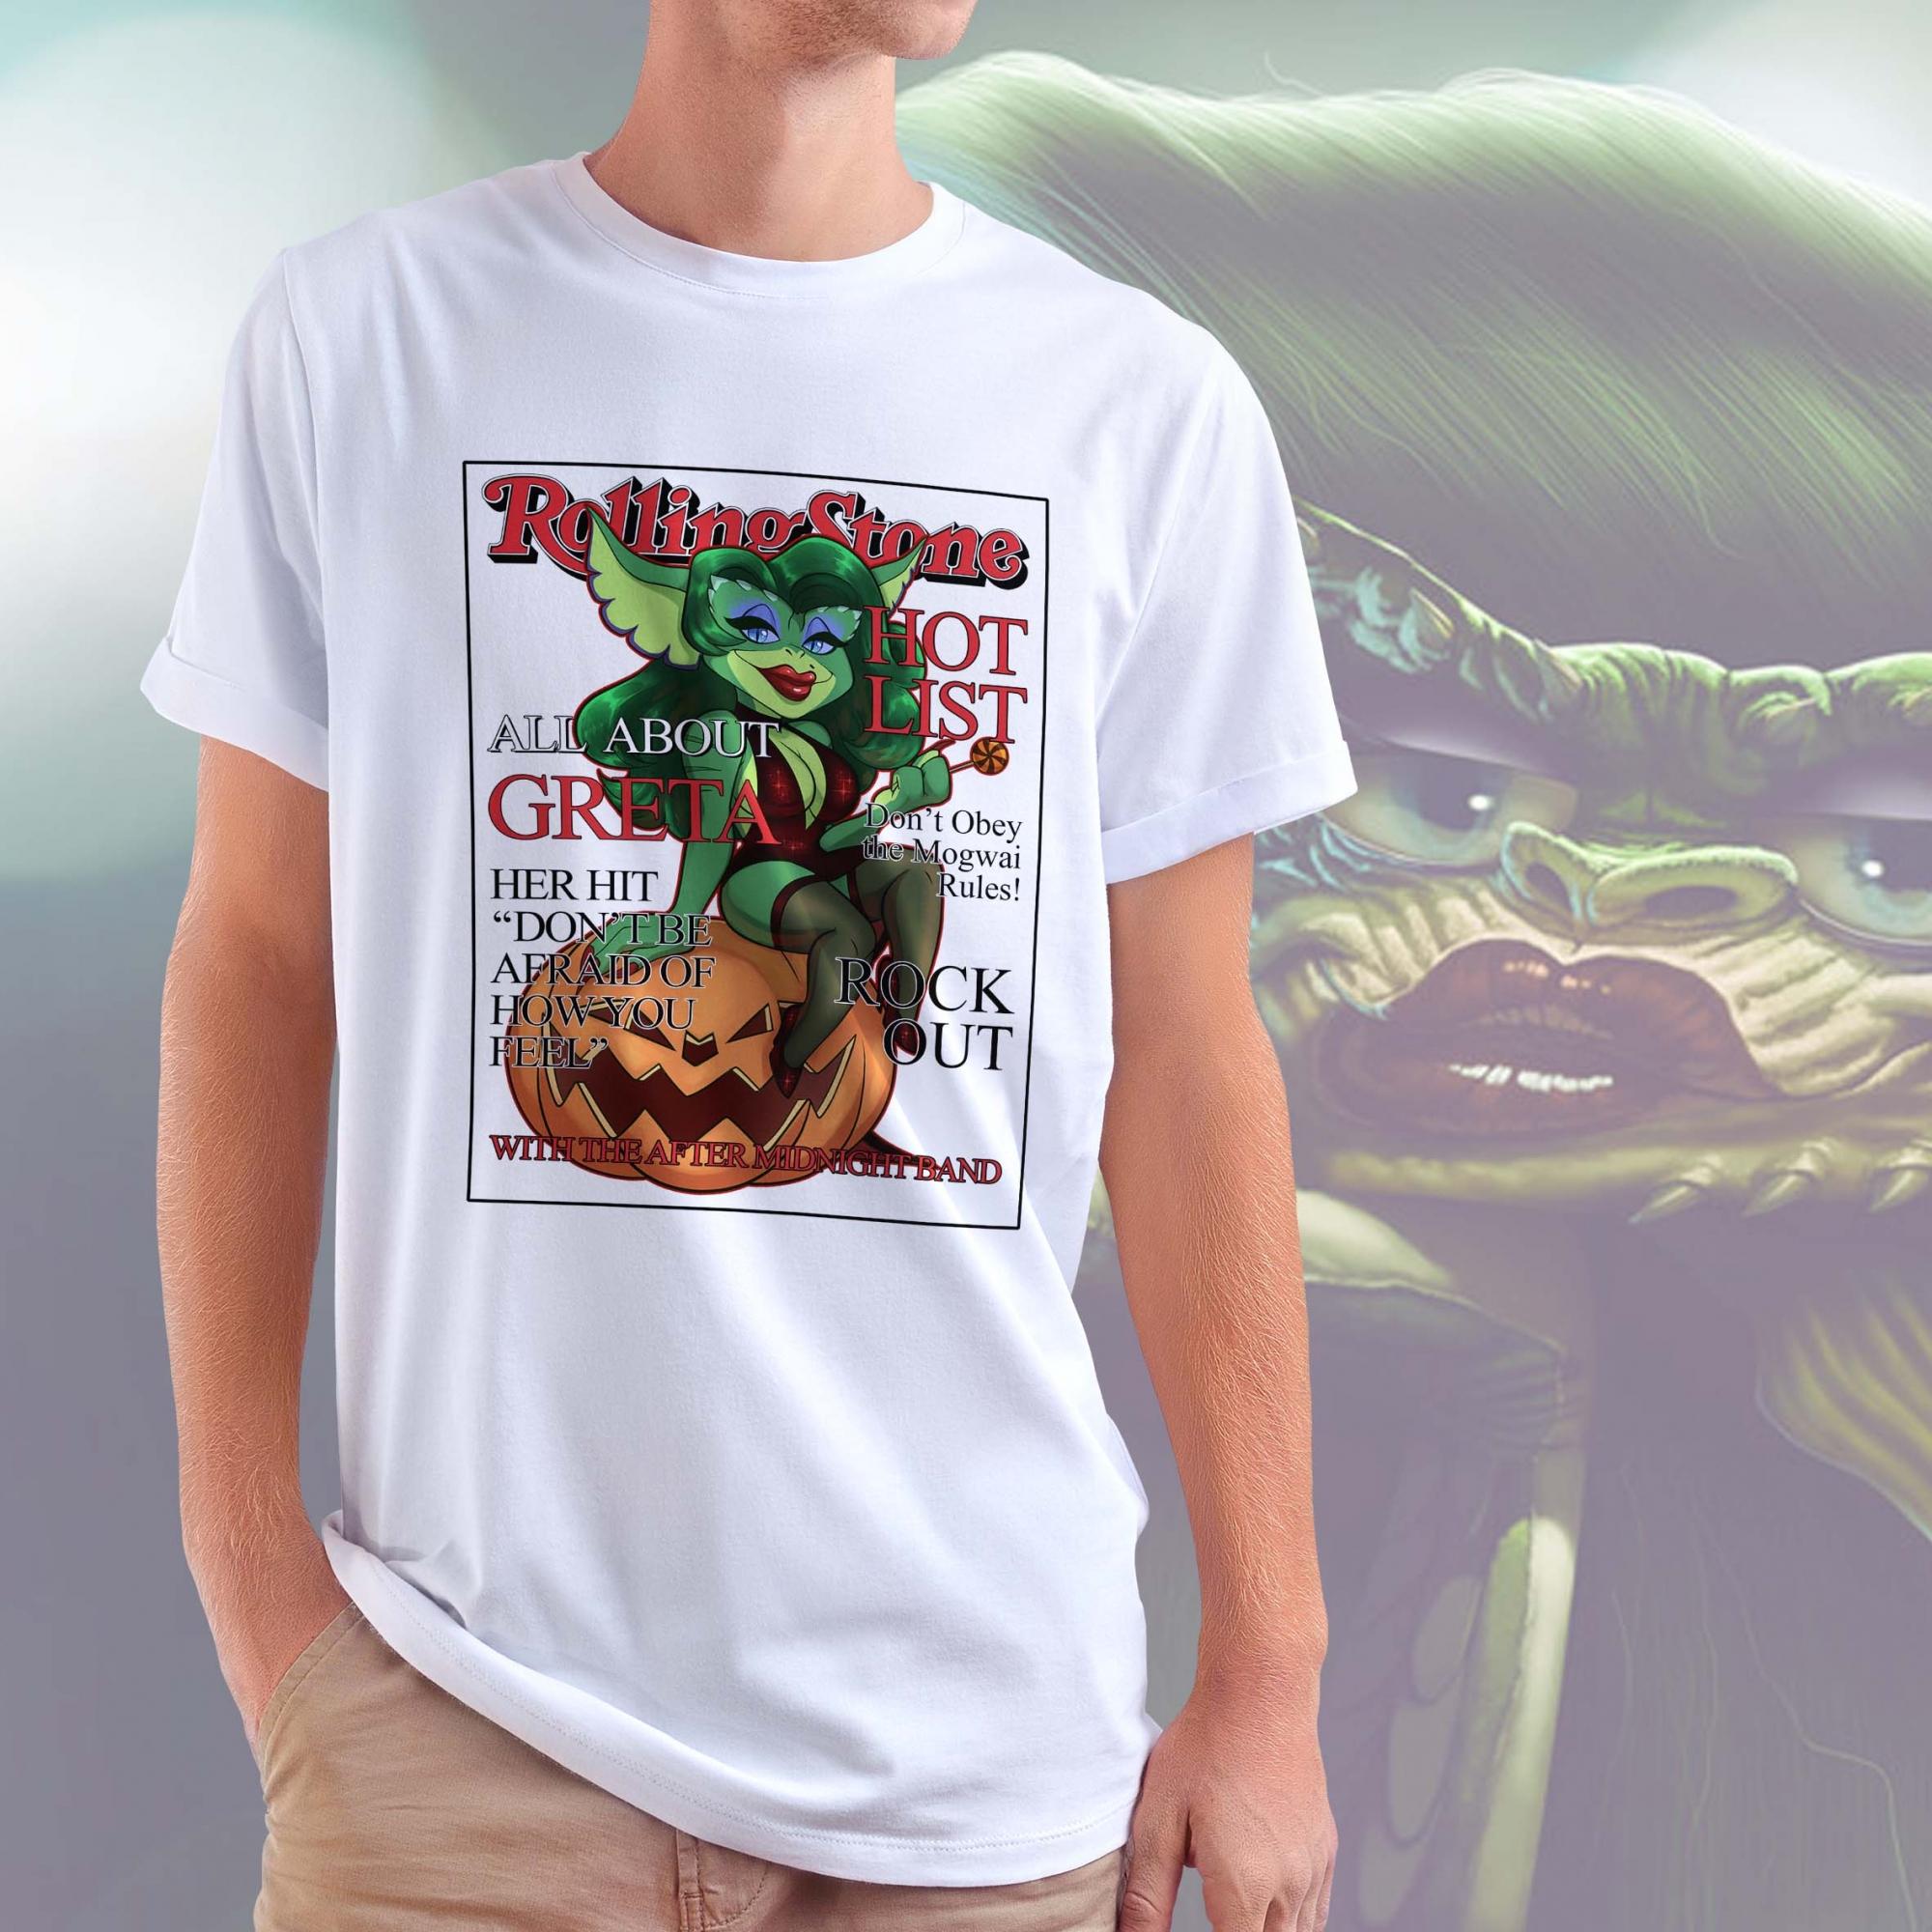 Camiseta Masculina Unissex Greta Gremlin Gremlins RollingStone (Branca) - EV